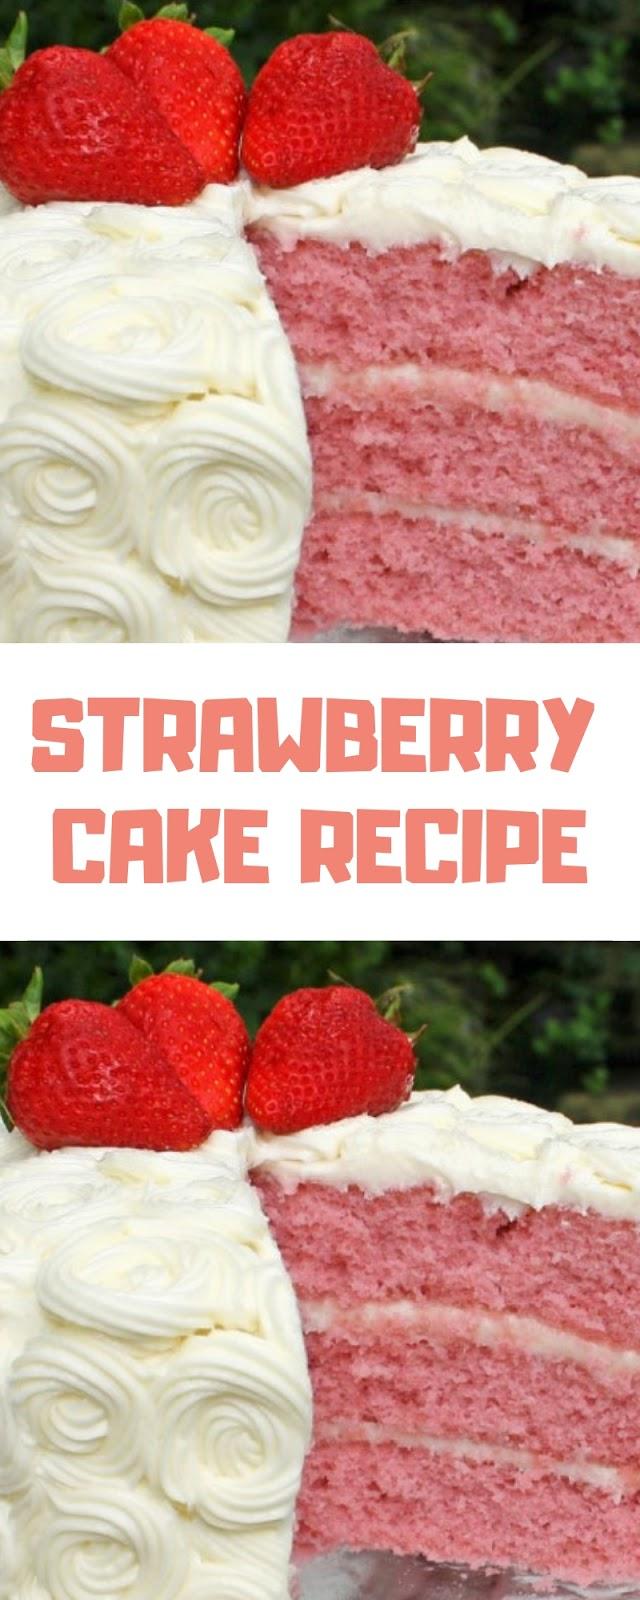 STRAWBERRY CAKE RECIPE